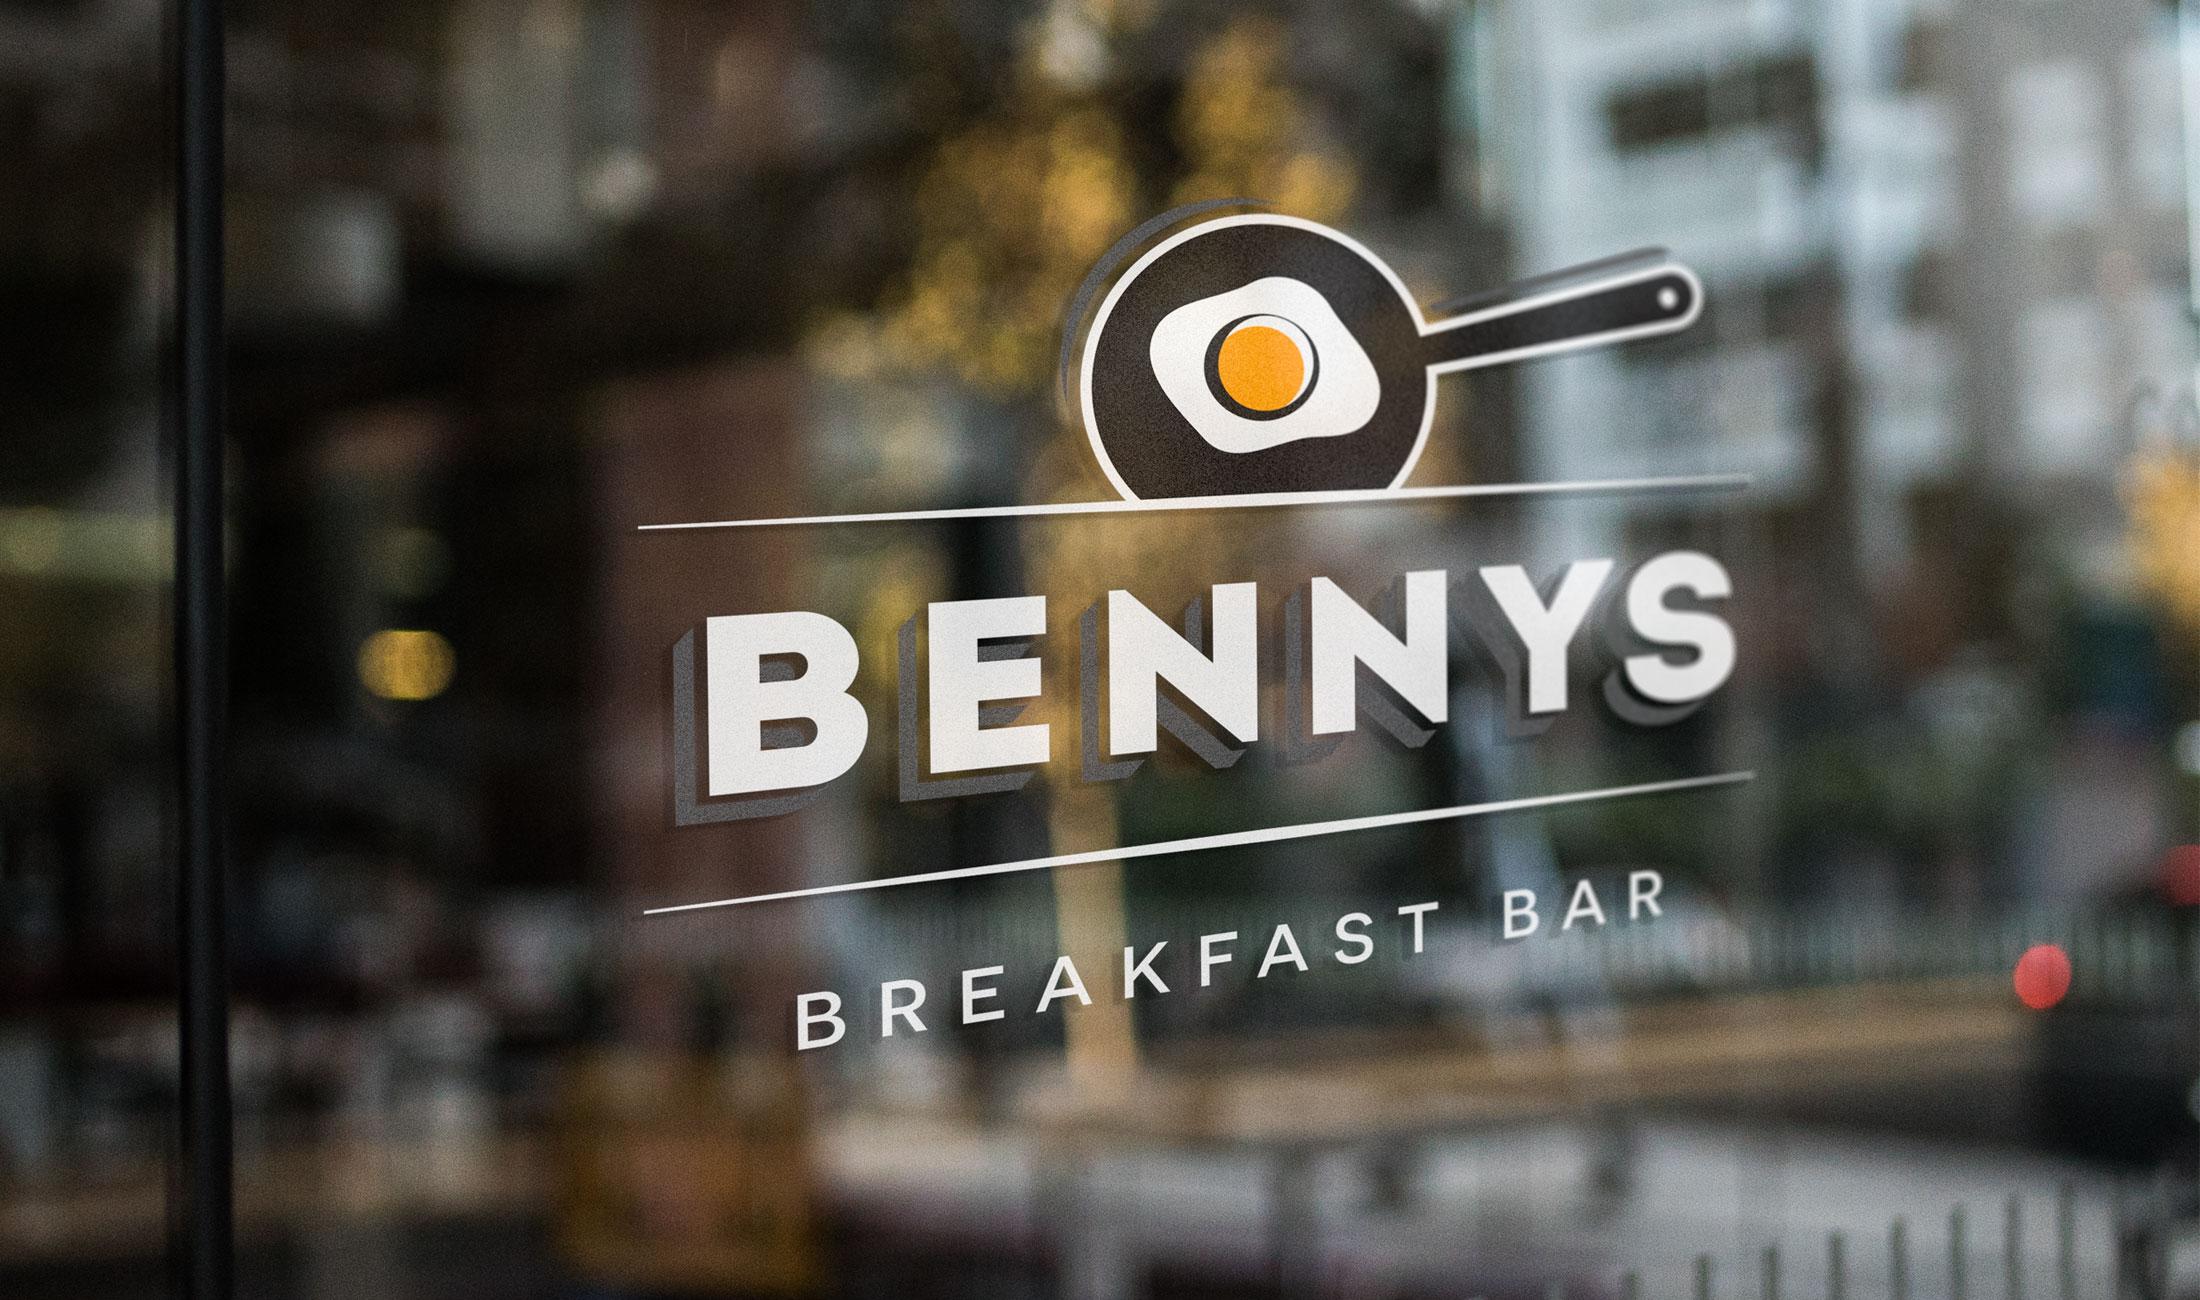 Bennys logo on a window